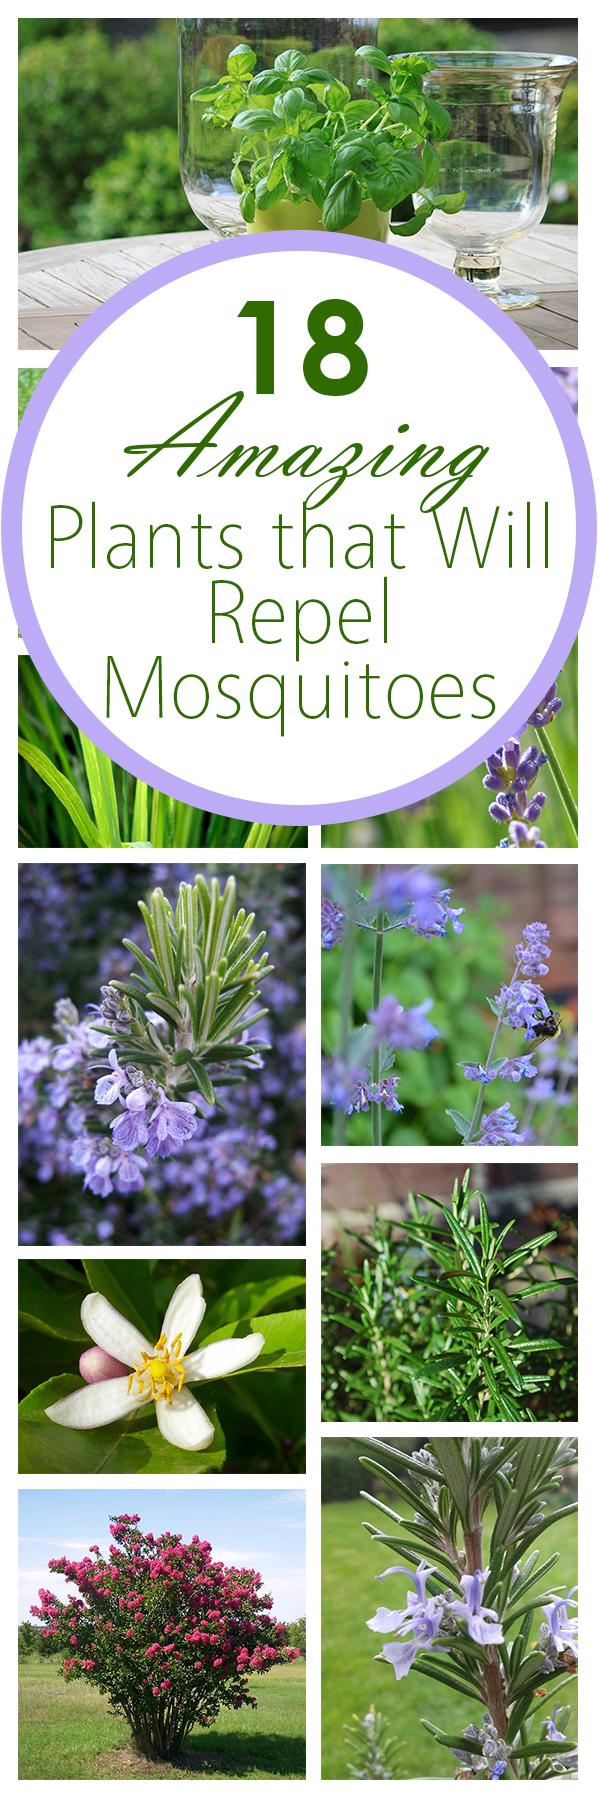 Natural pest control, mosquito control, natural mosquito repellent, gardening hacks, garden pest control, tips and tricks, gardening tips and tricks, popular pin